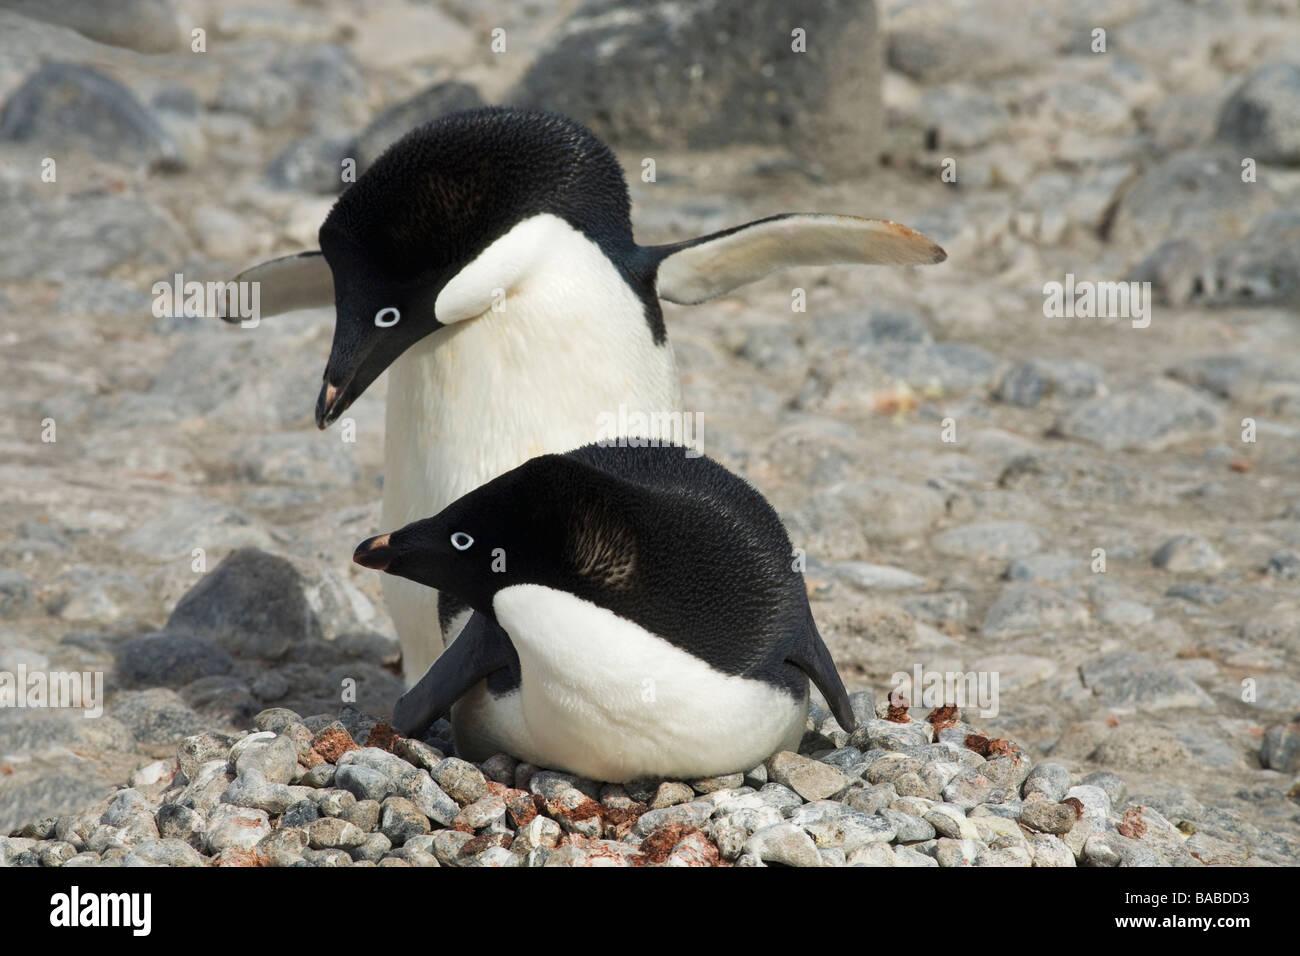 Breeding pair of Adelie penguins Pygoscelis adeliae on nest of small stones Paulet Island Antarctic Peninsula Antarctica - Stock Image